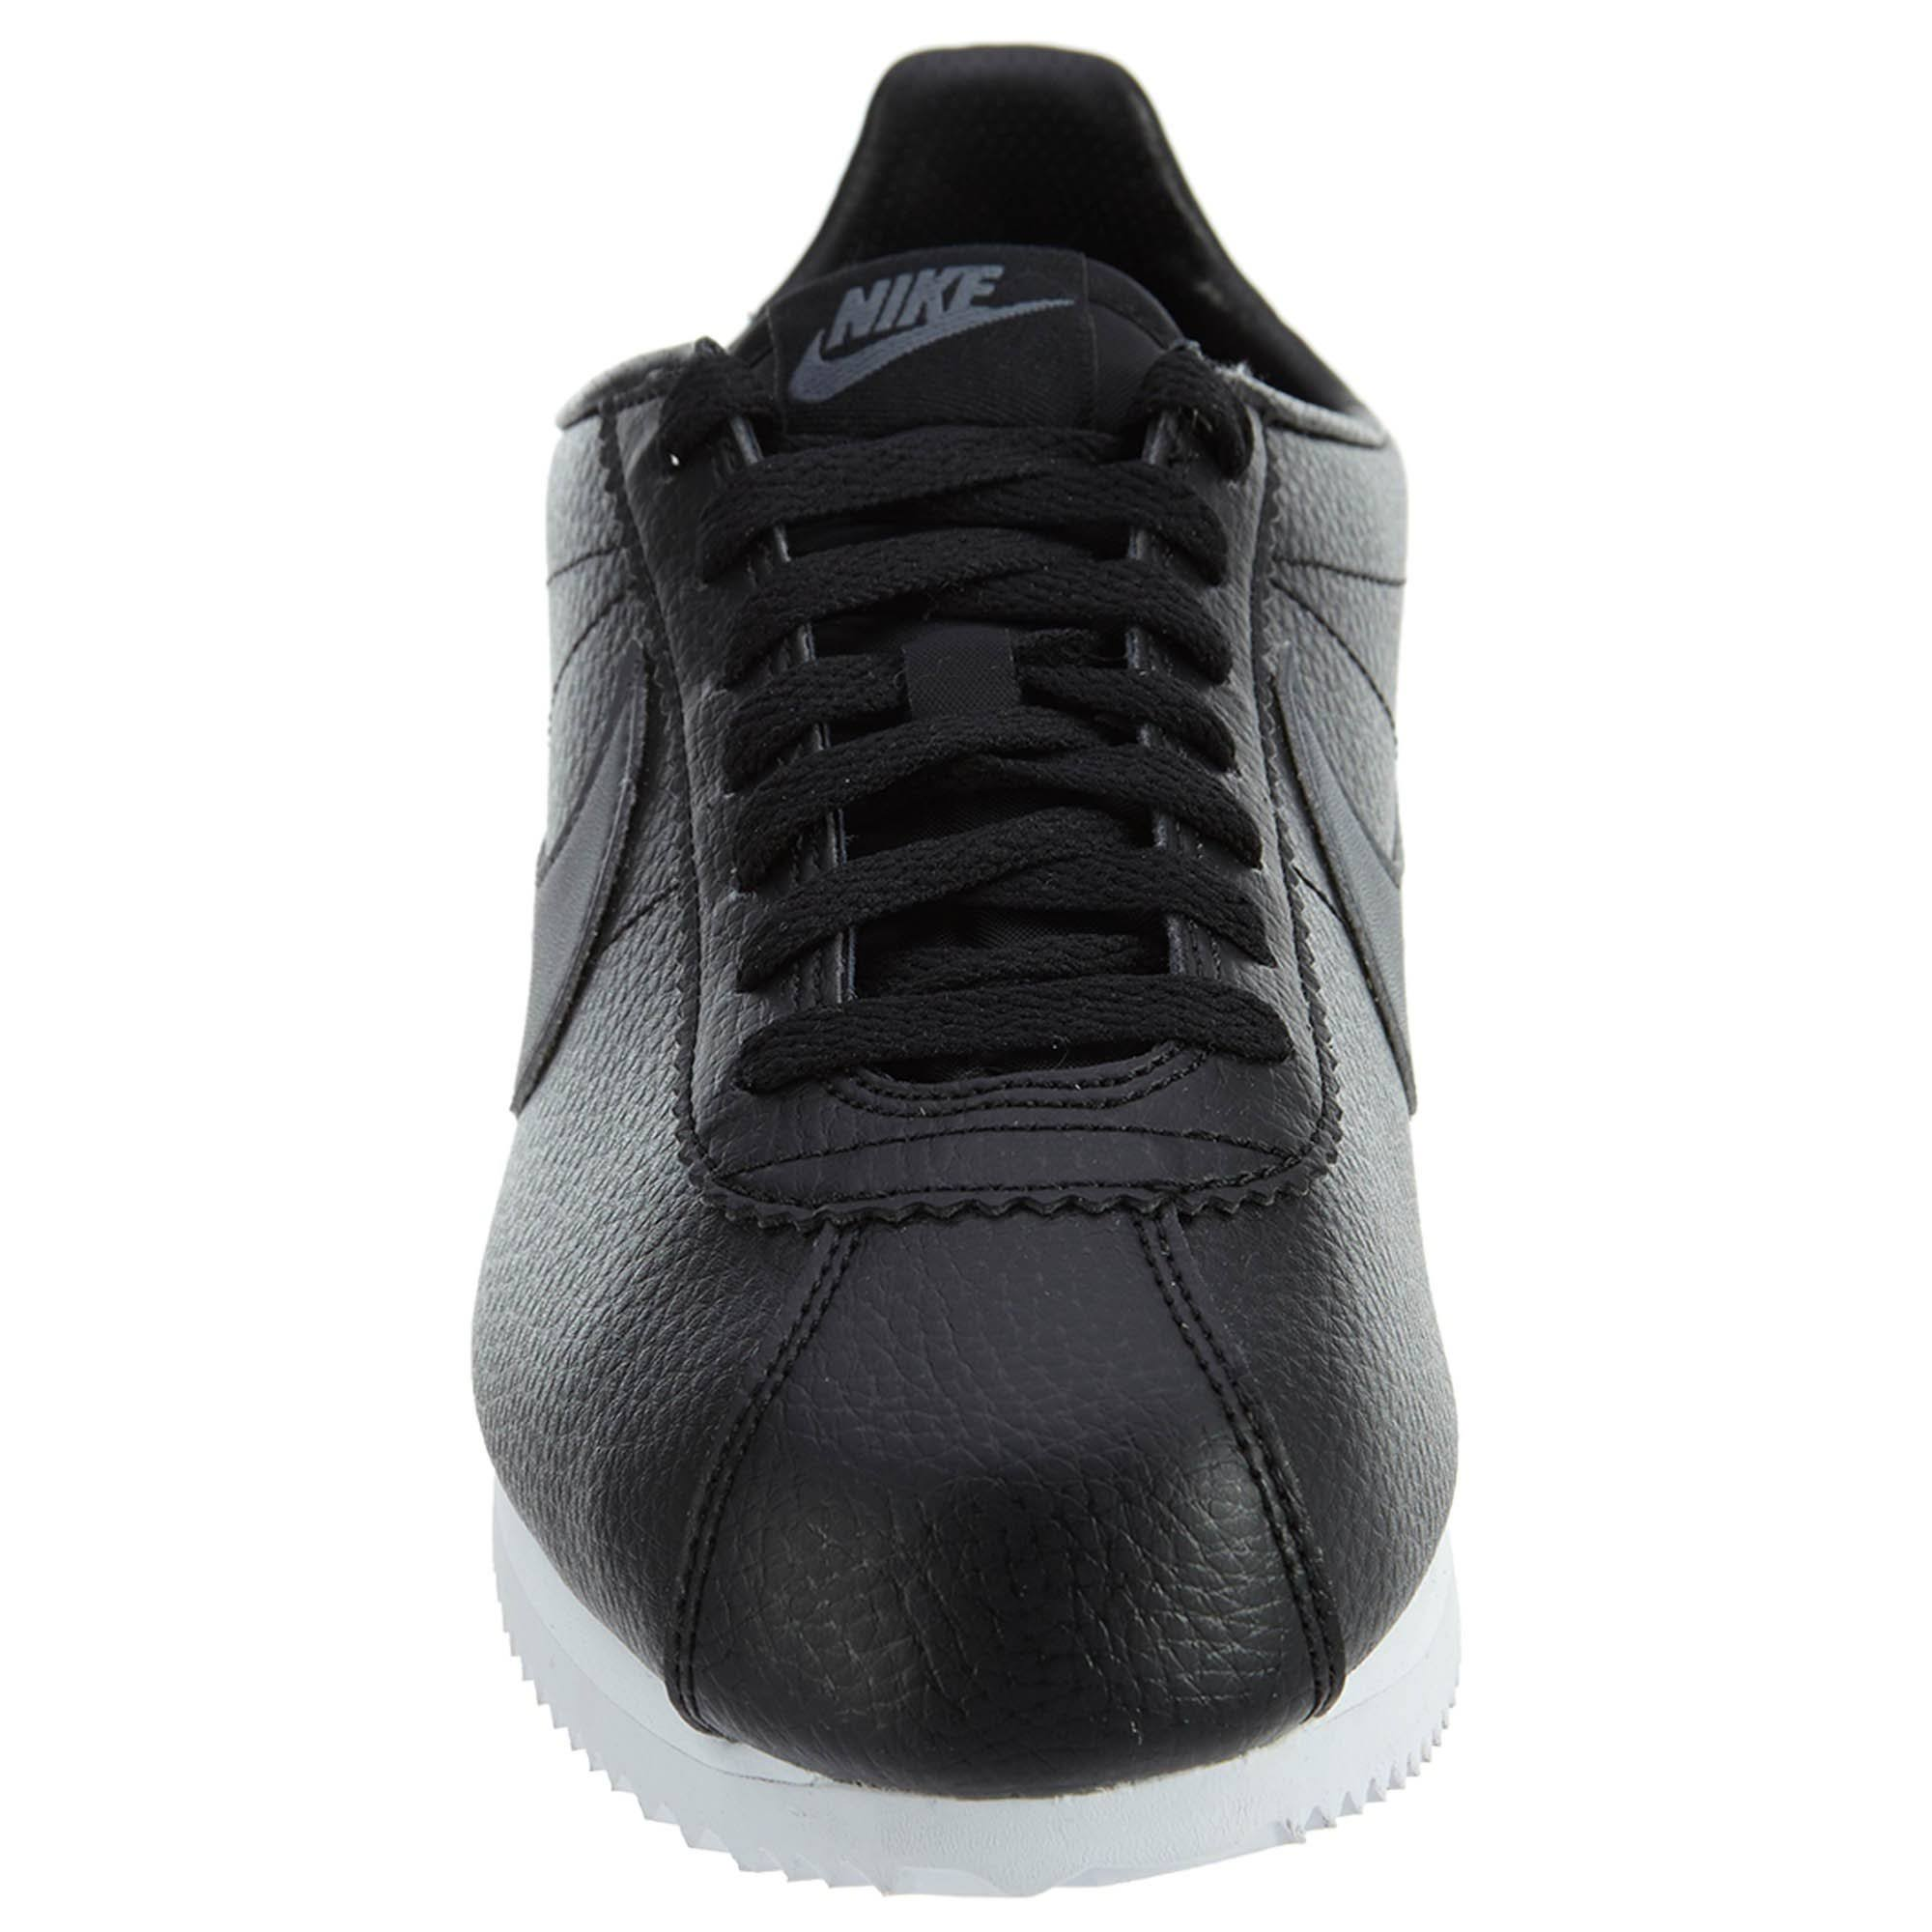 8 Gris Oscuro 749571 011 Leather Cortez Nike Tamaño blanco Classic Negro Hombre fq0xCwWUz